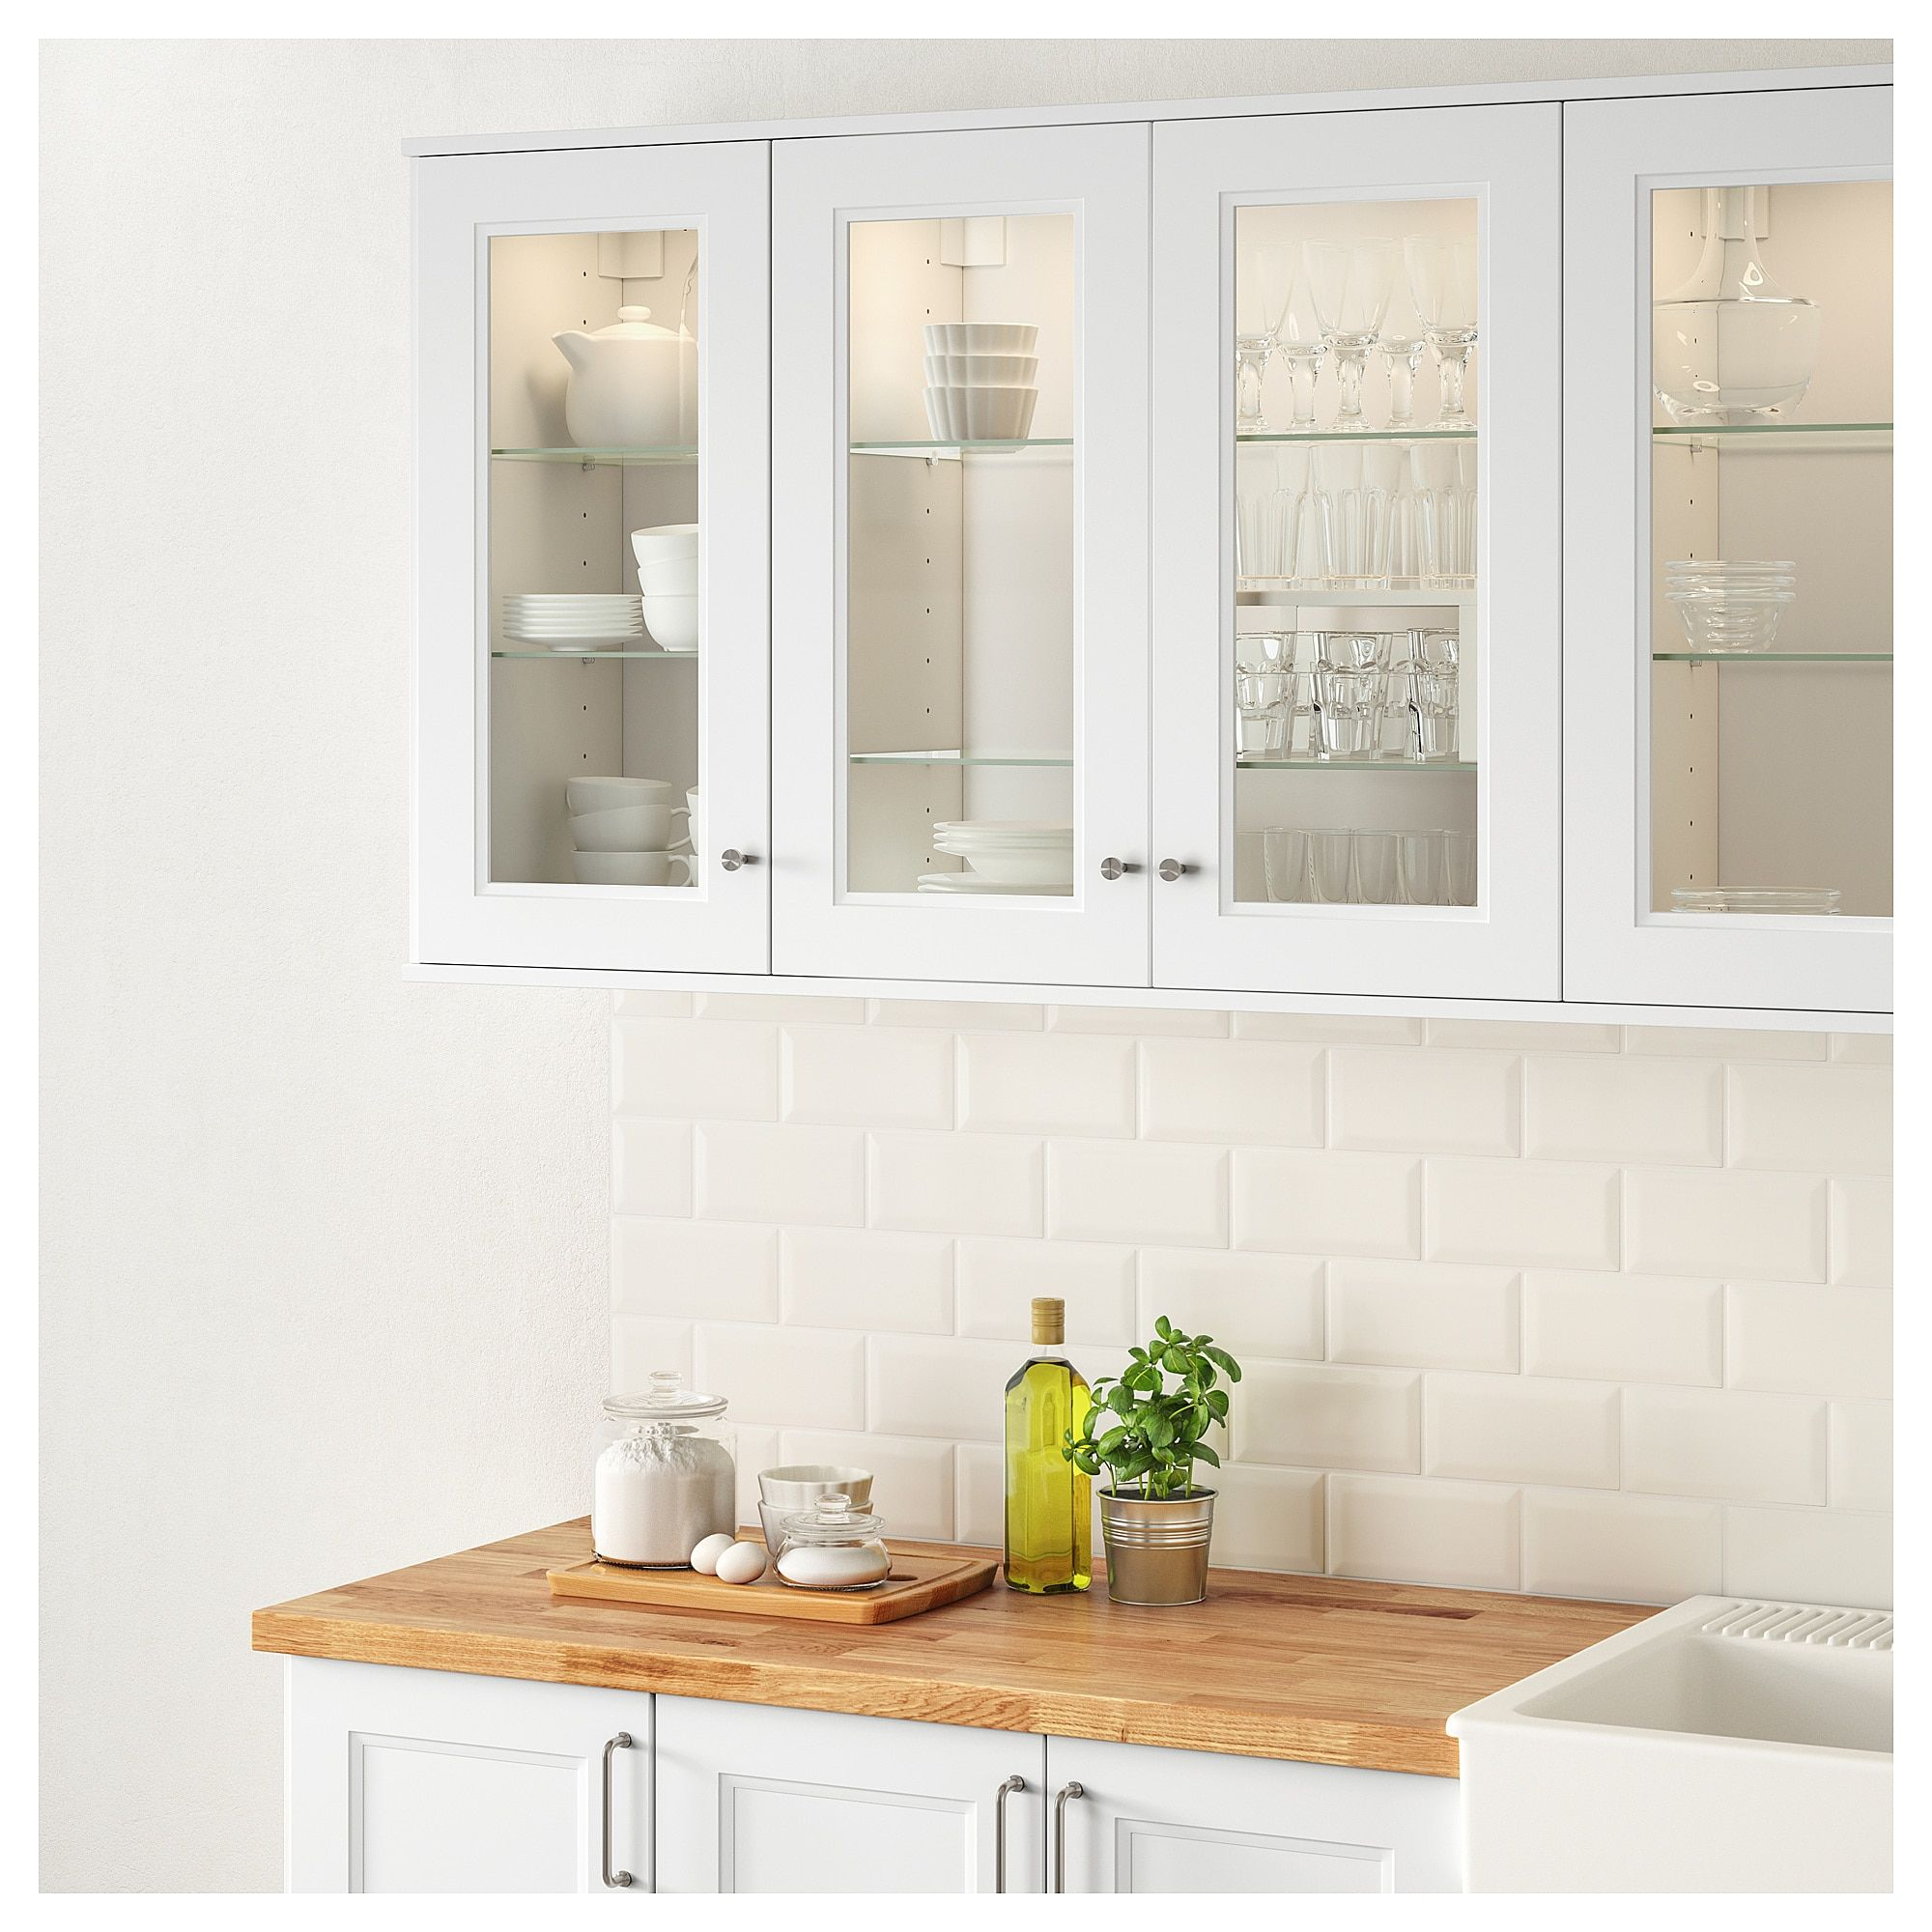 Ikea Axstad Matt White Glass Door New Kitchen Cabinets Glass